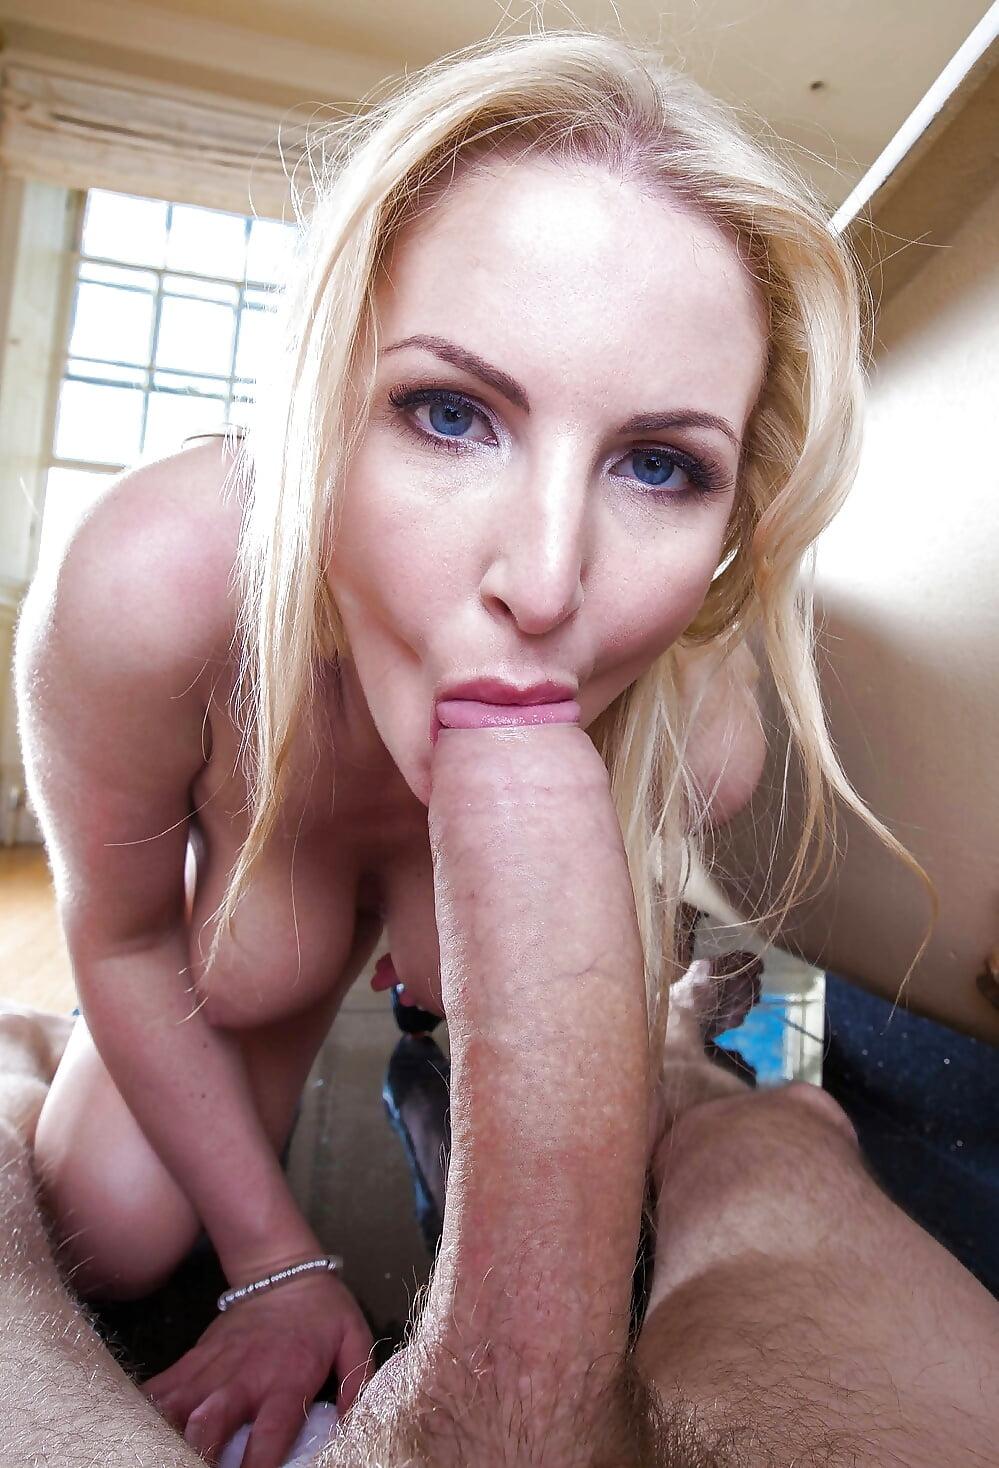 Hot Blonde Maryjane Gets Big Dick Down Her Throat